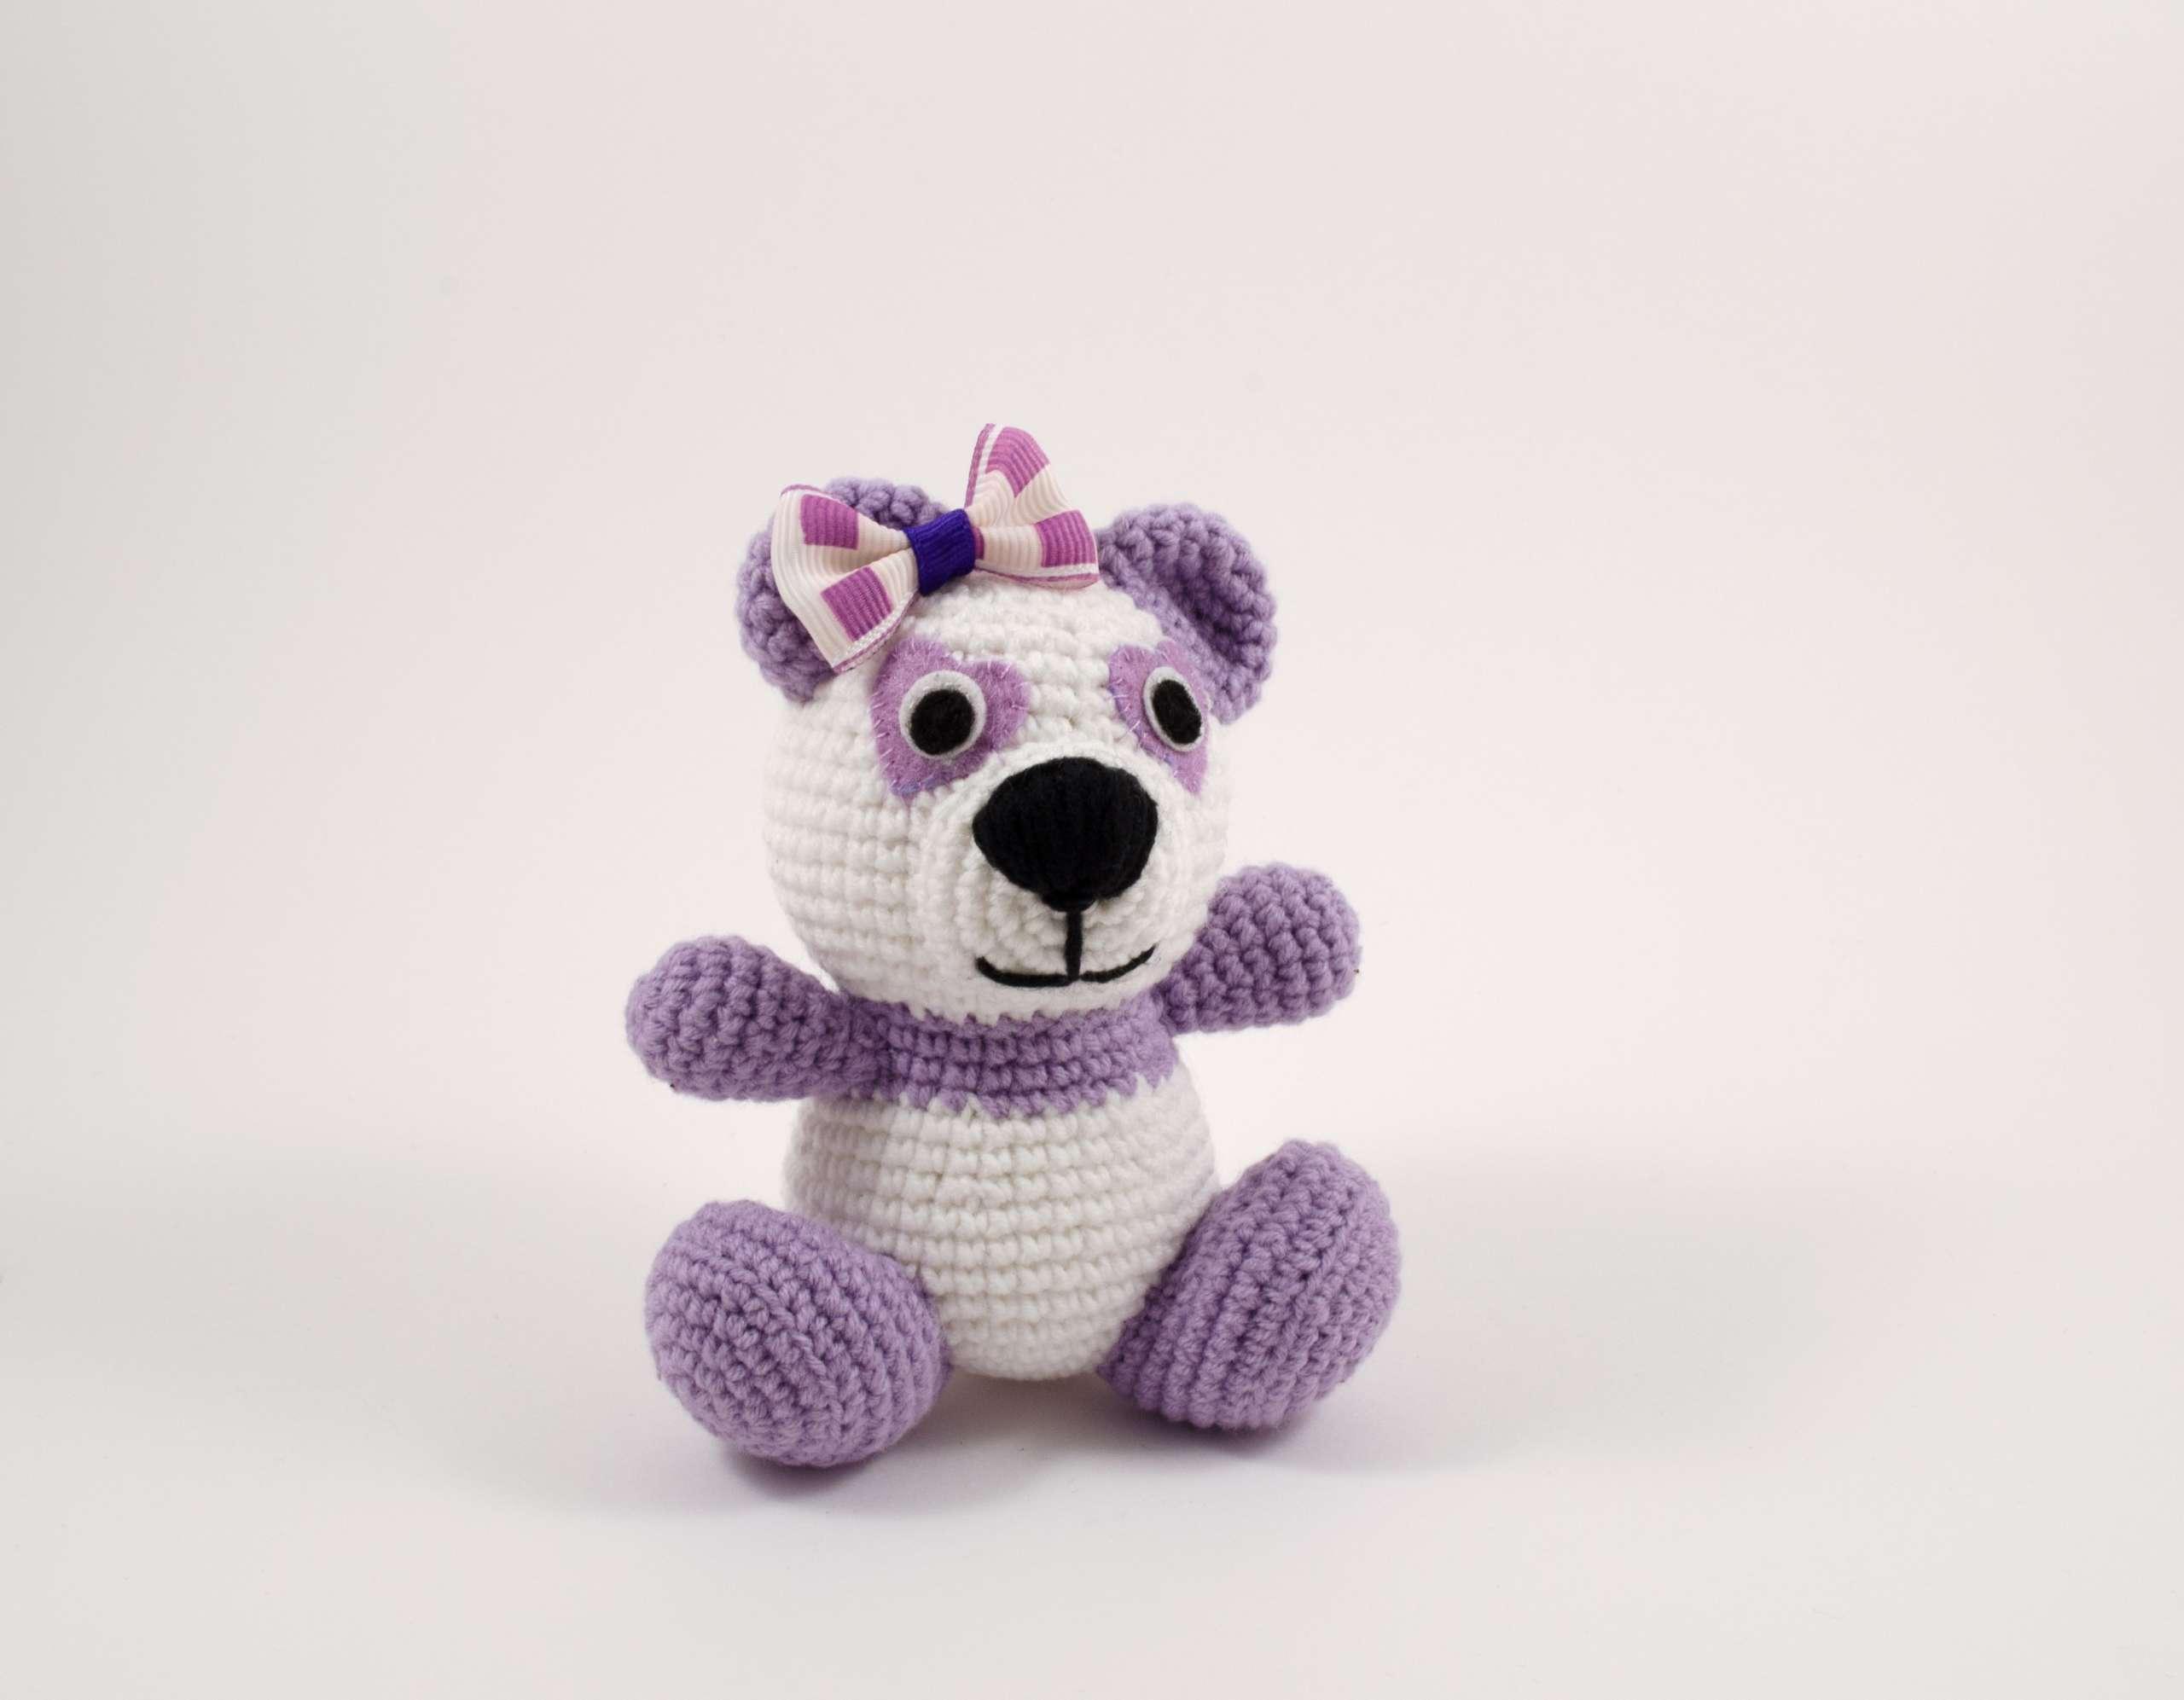 crochet purple panda front view